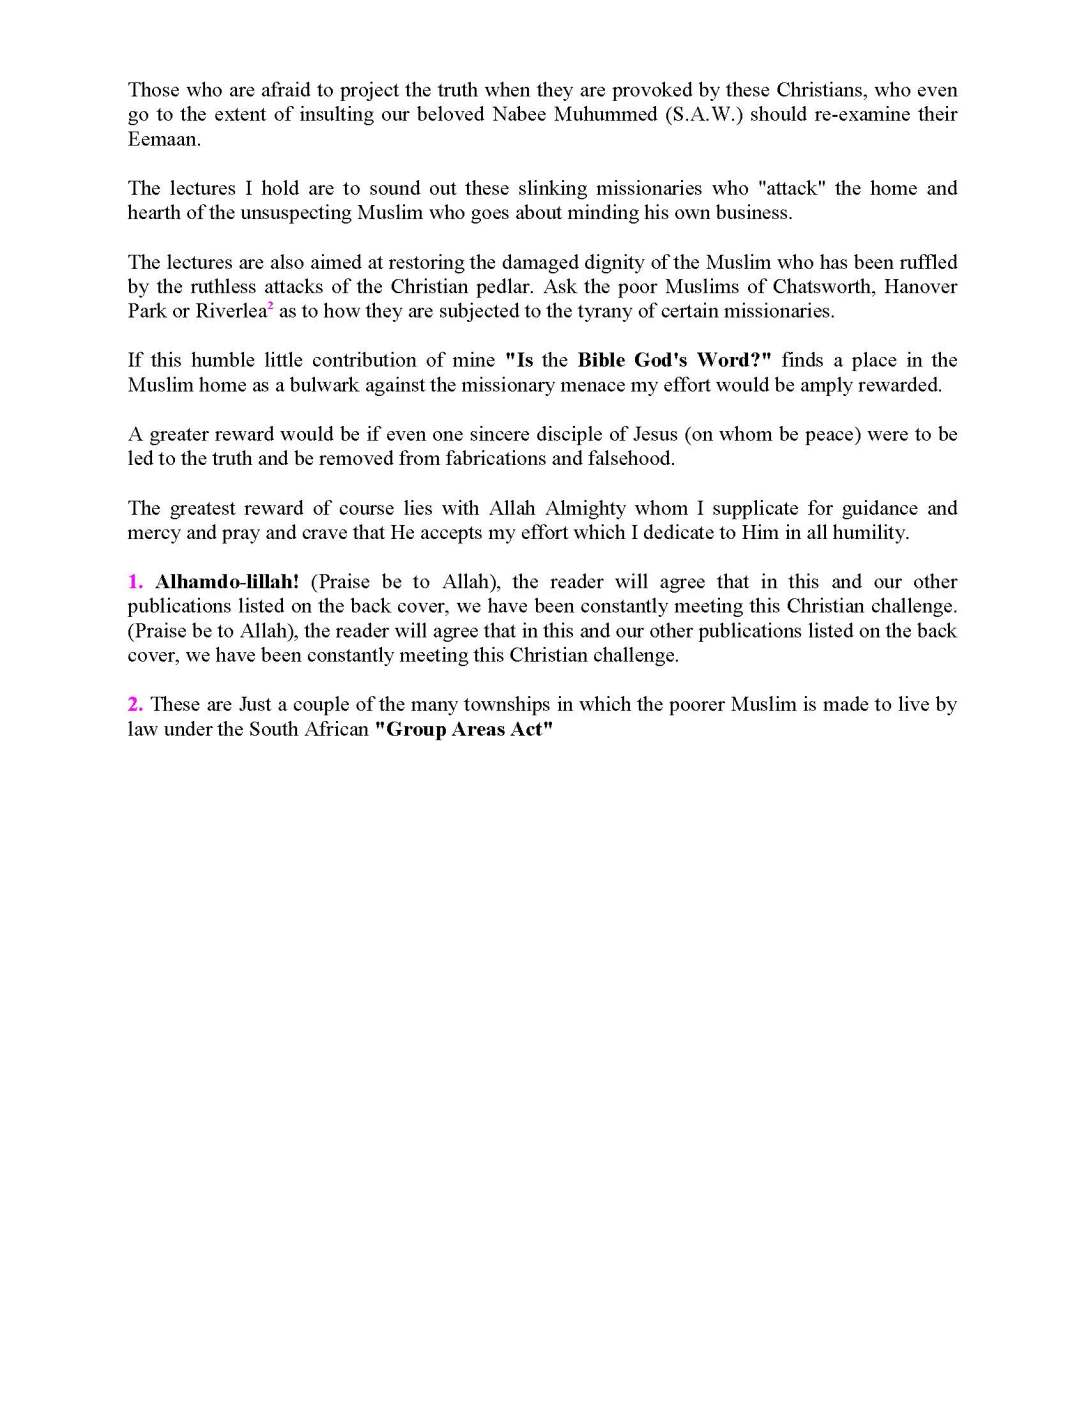 Is The Bible Gods Word [deedat]_Page_47